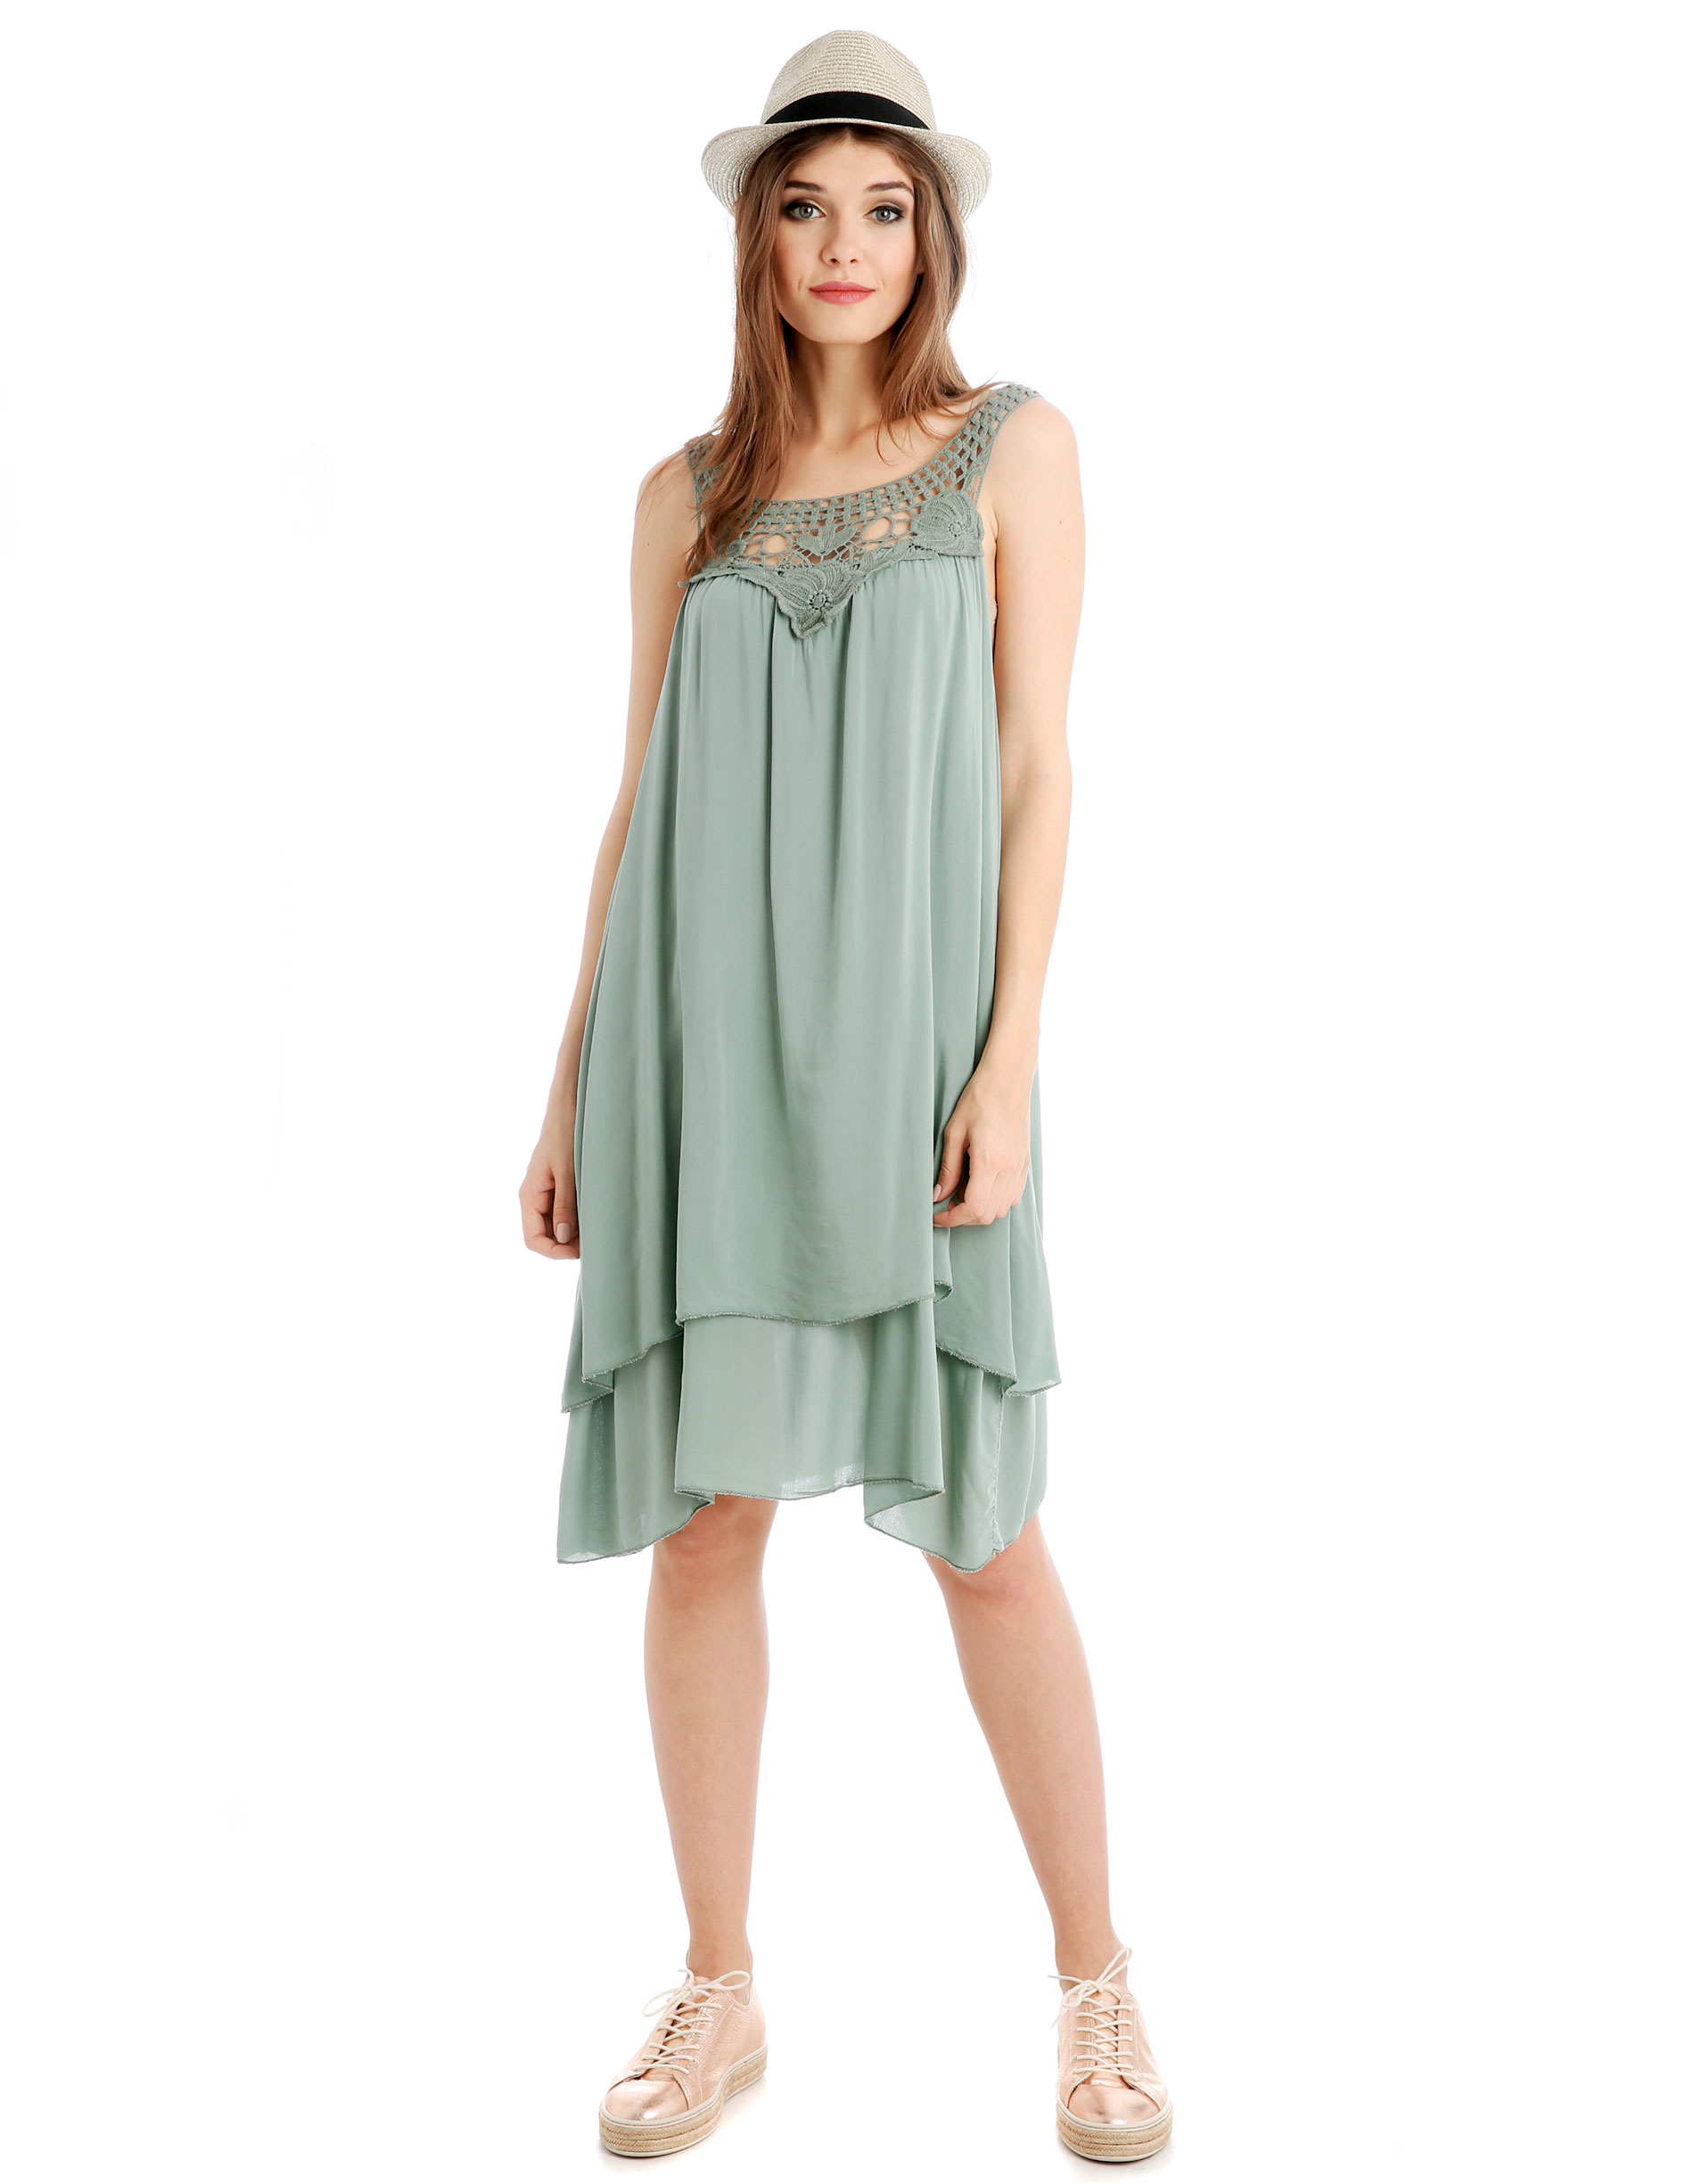 Sukienka - 103-8852 MILI - Unisono